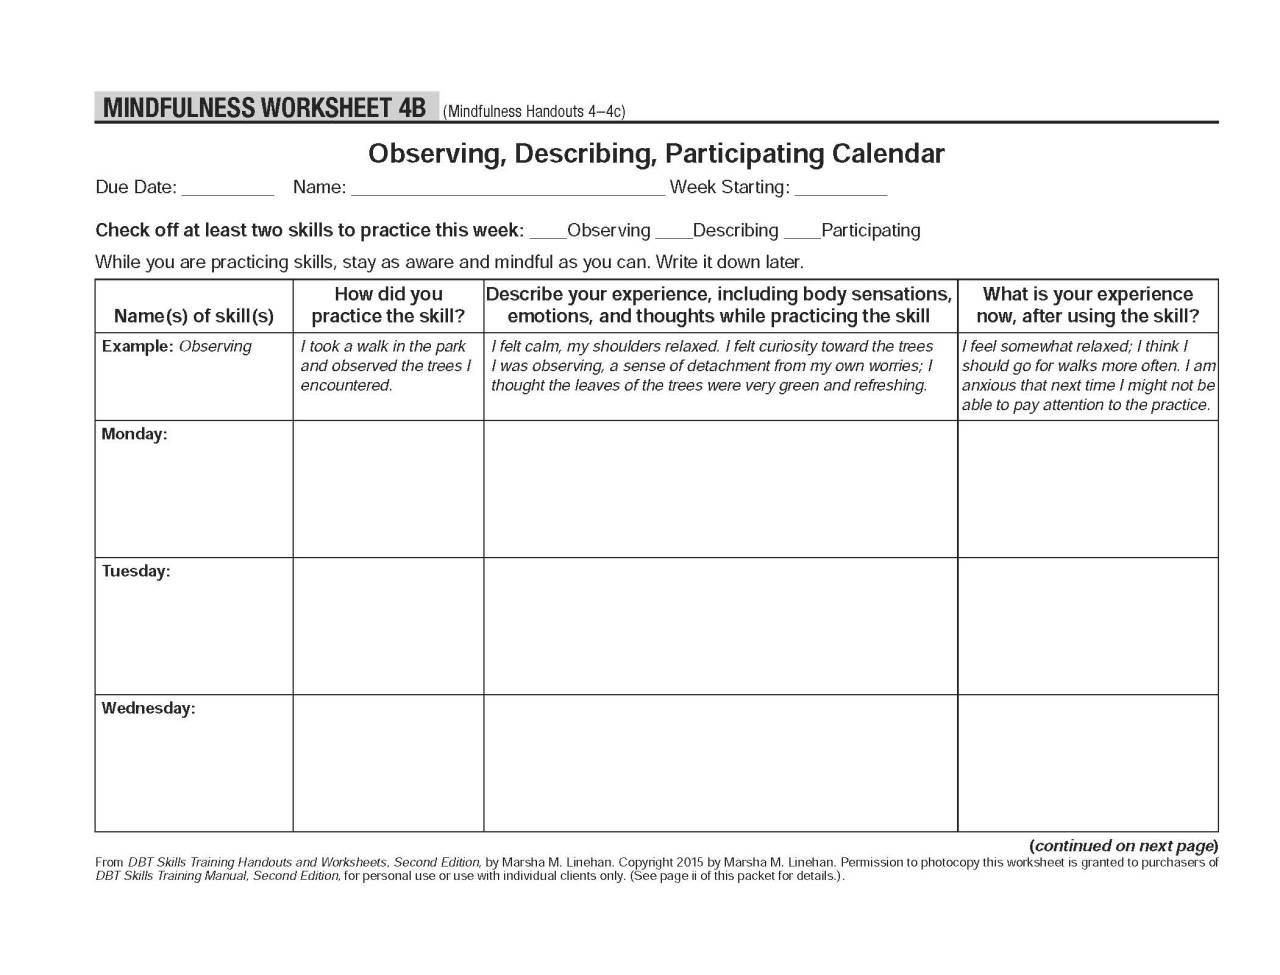 Worksheets Dbt Worksheets Atidentity Free Worksheets